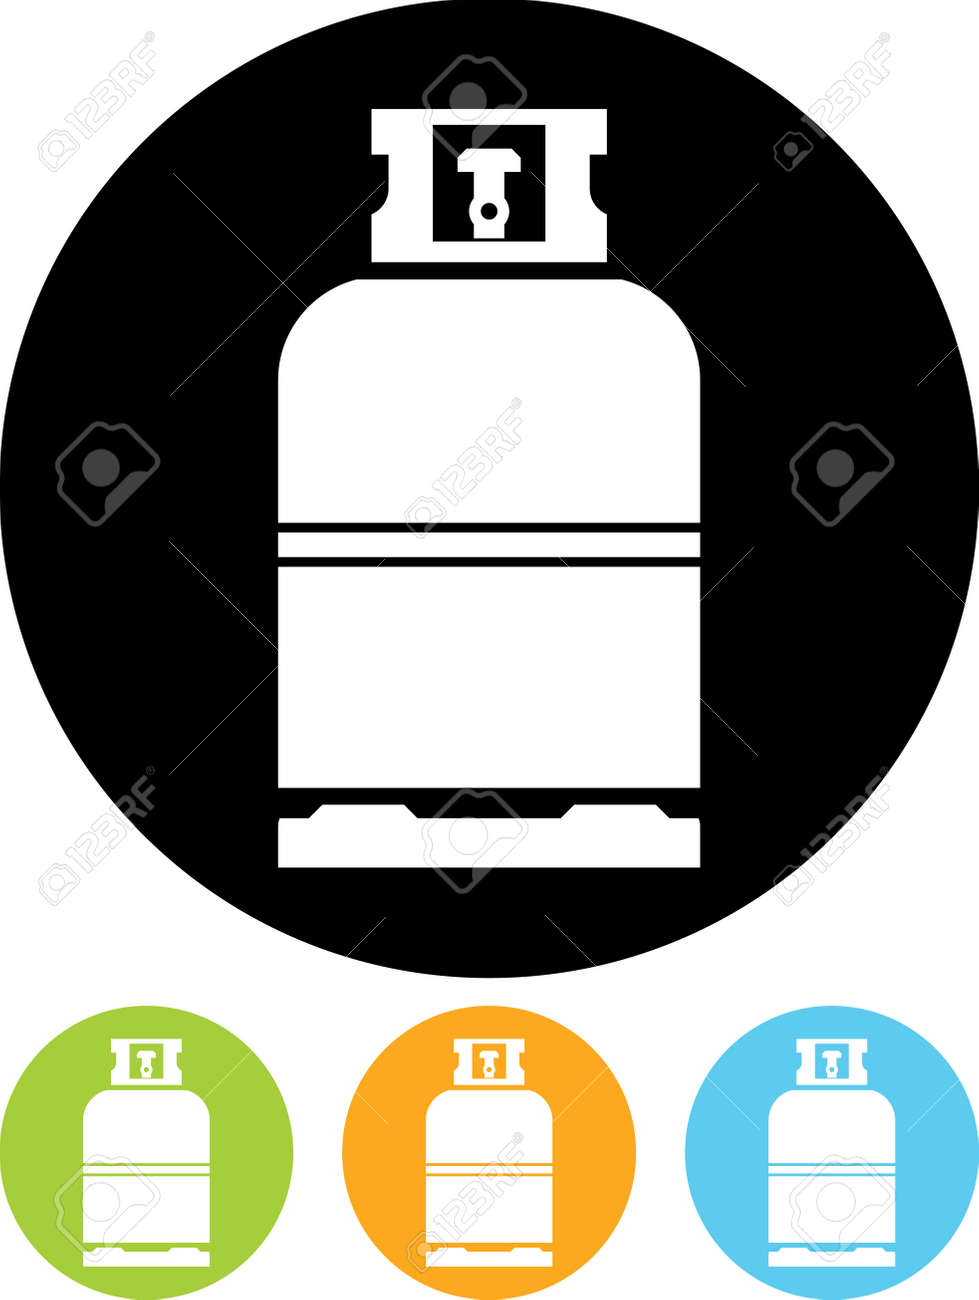 Gas bottle vector icon - 52948025